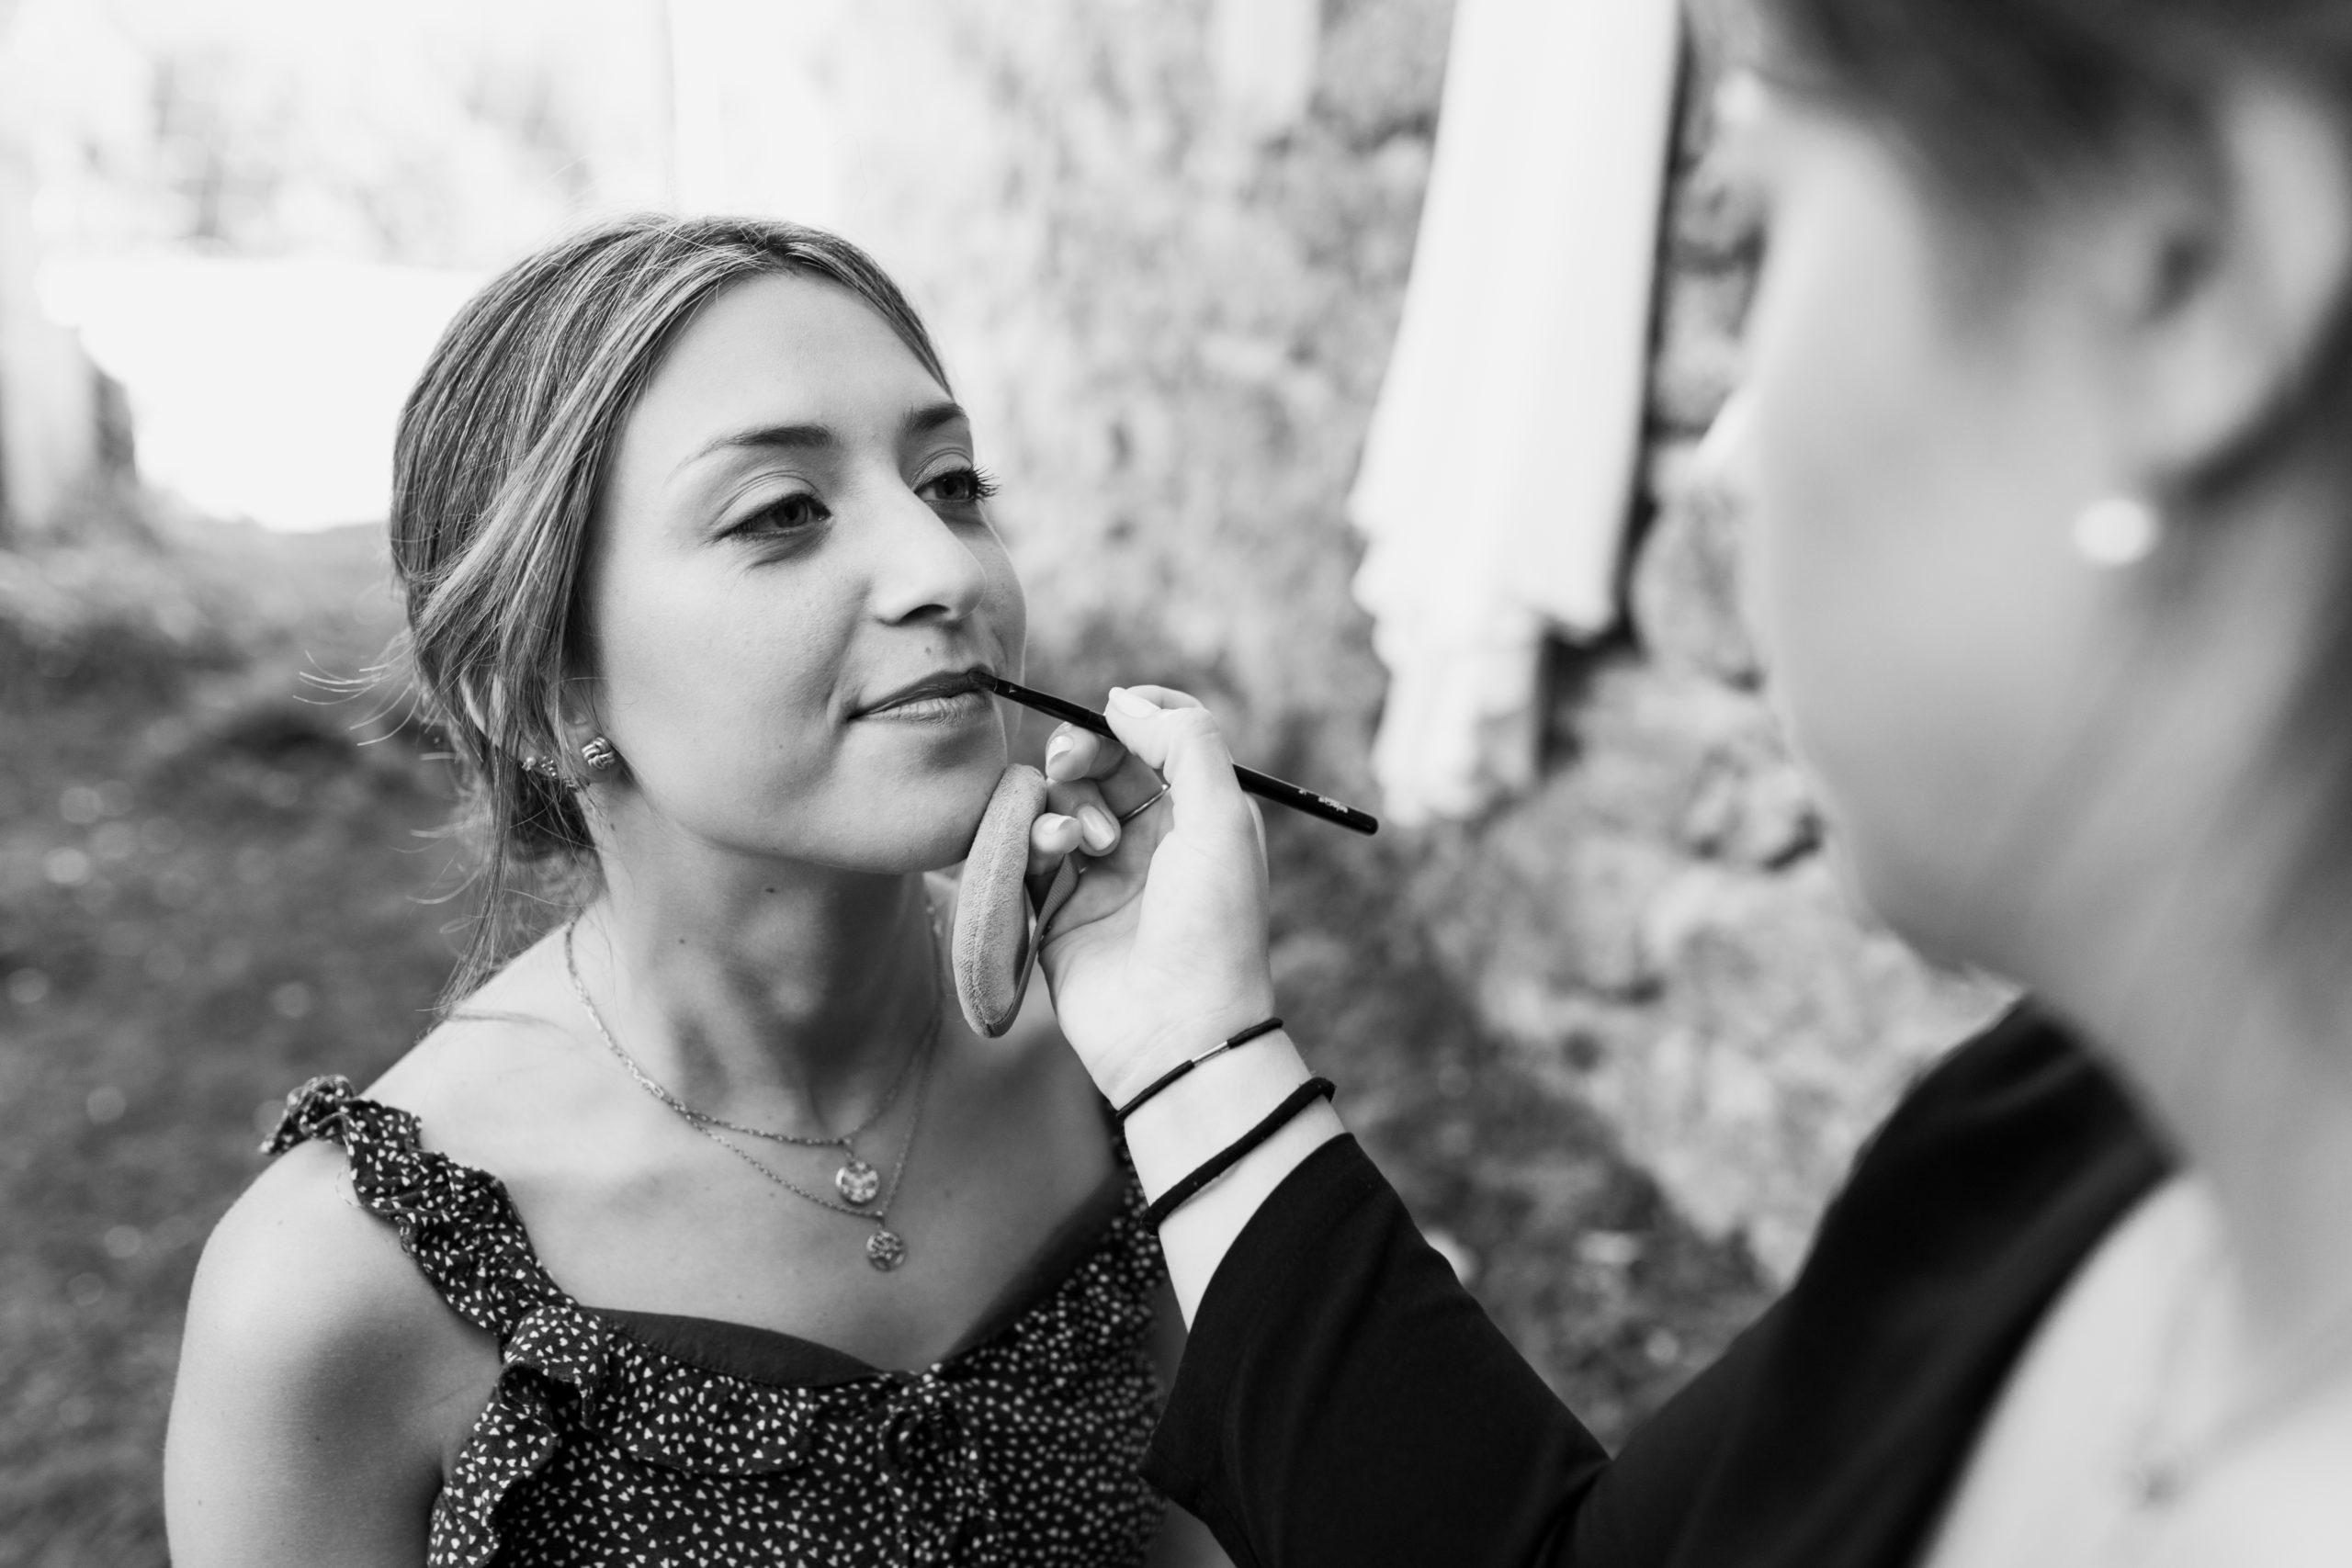 Proceso maquillaje de la novia